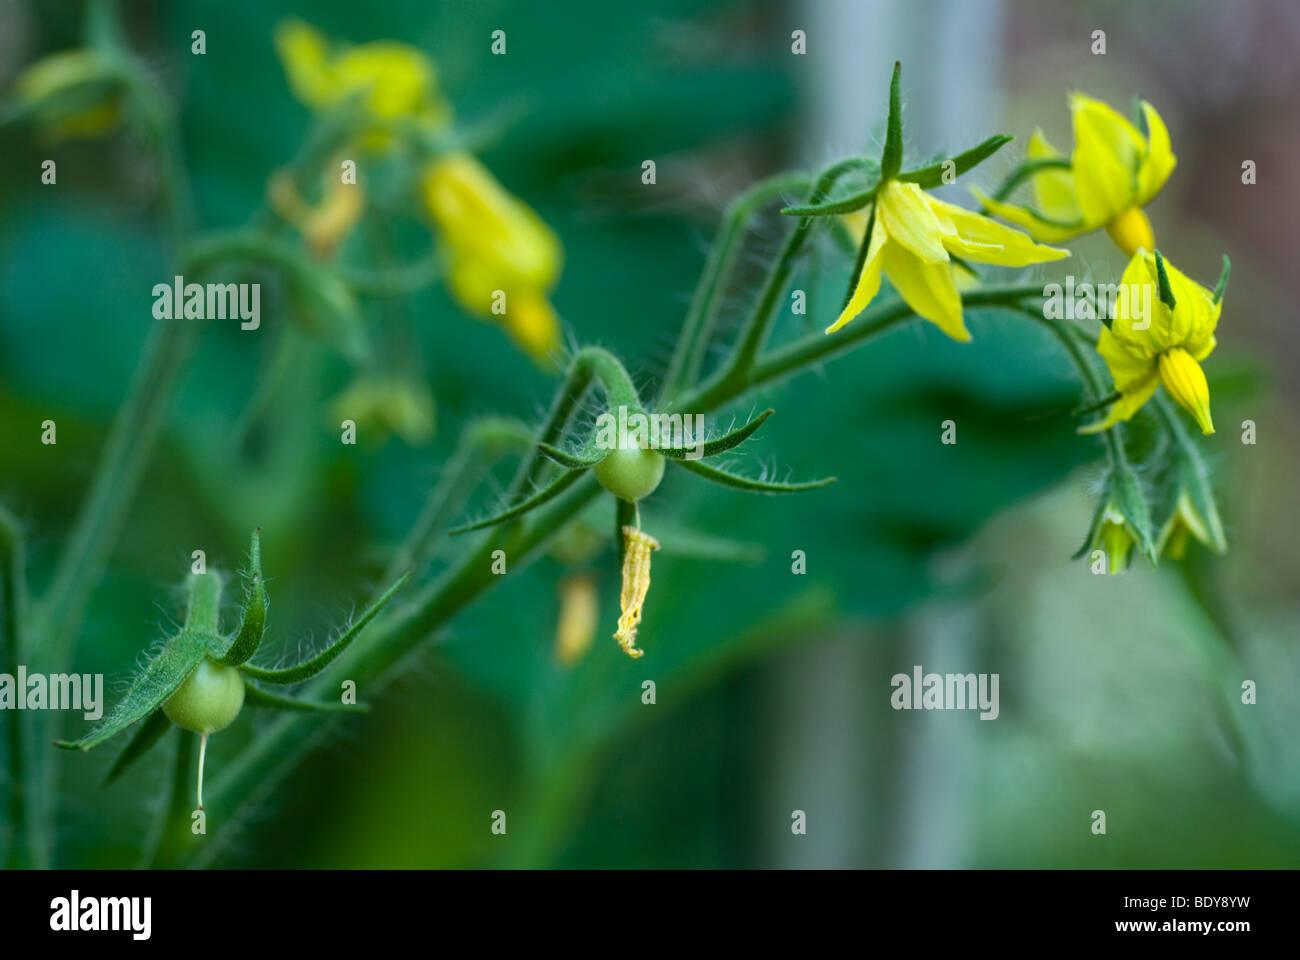 Yellow flowering tomato plant solanum lycopersicum lycopersicon yellow flowering tomato plant solanum lycopersicum lycopersicon esculentum mightylinksfo Choice Image